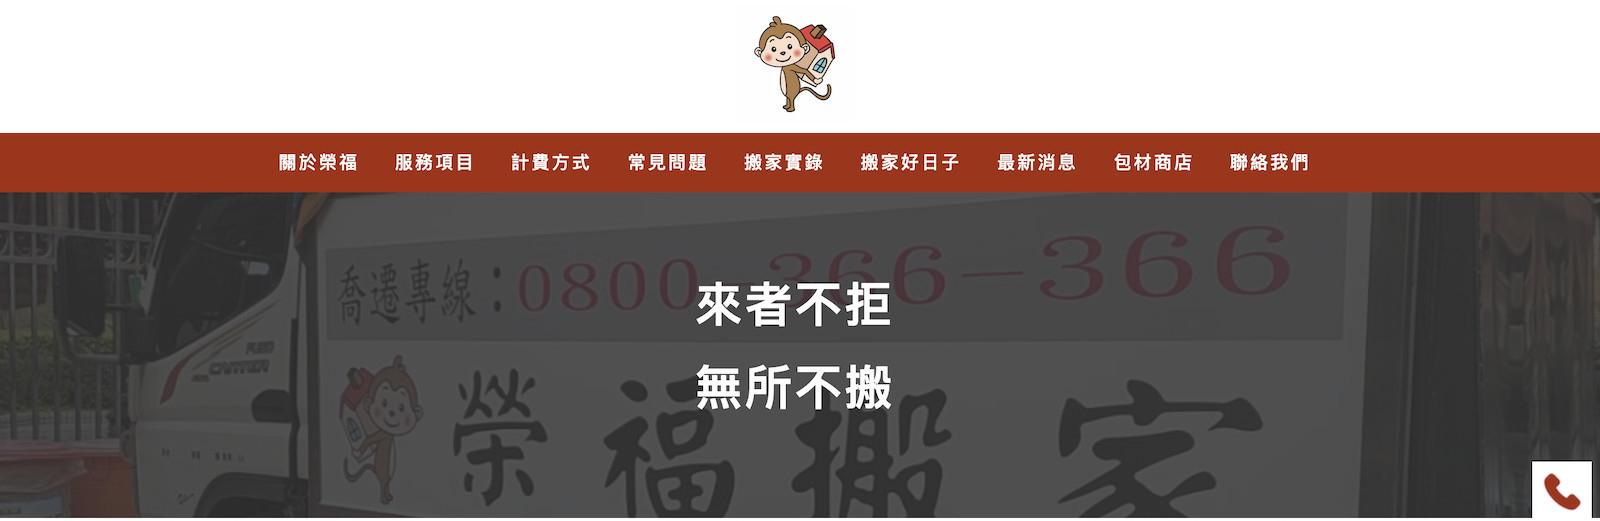 【SEO網頁設計成功案例】榮福搬家貨運有限公司